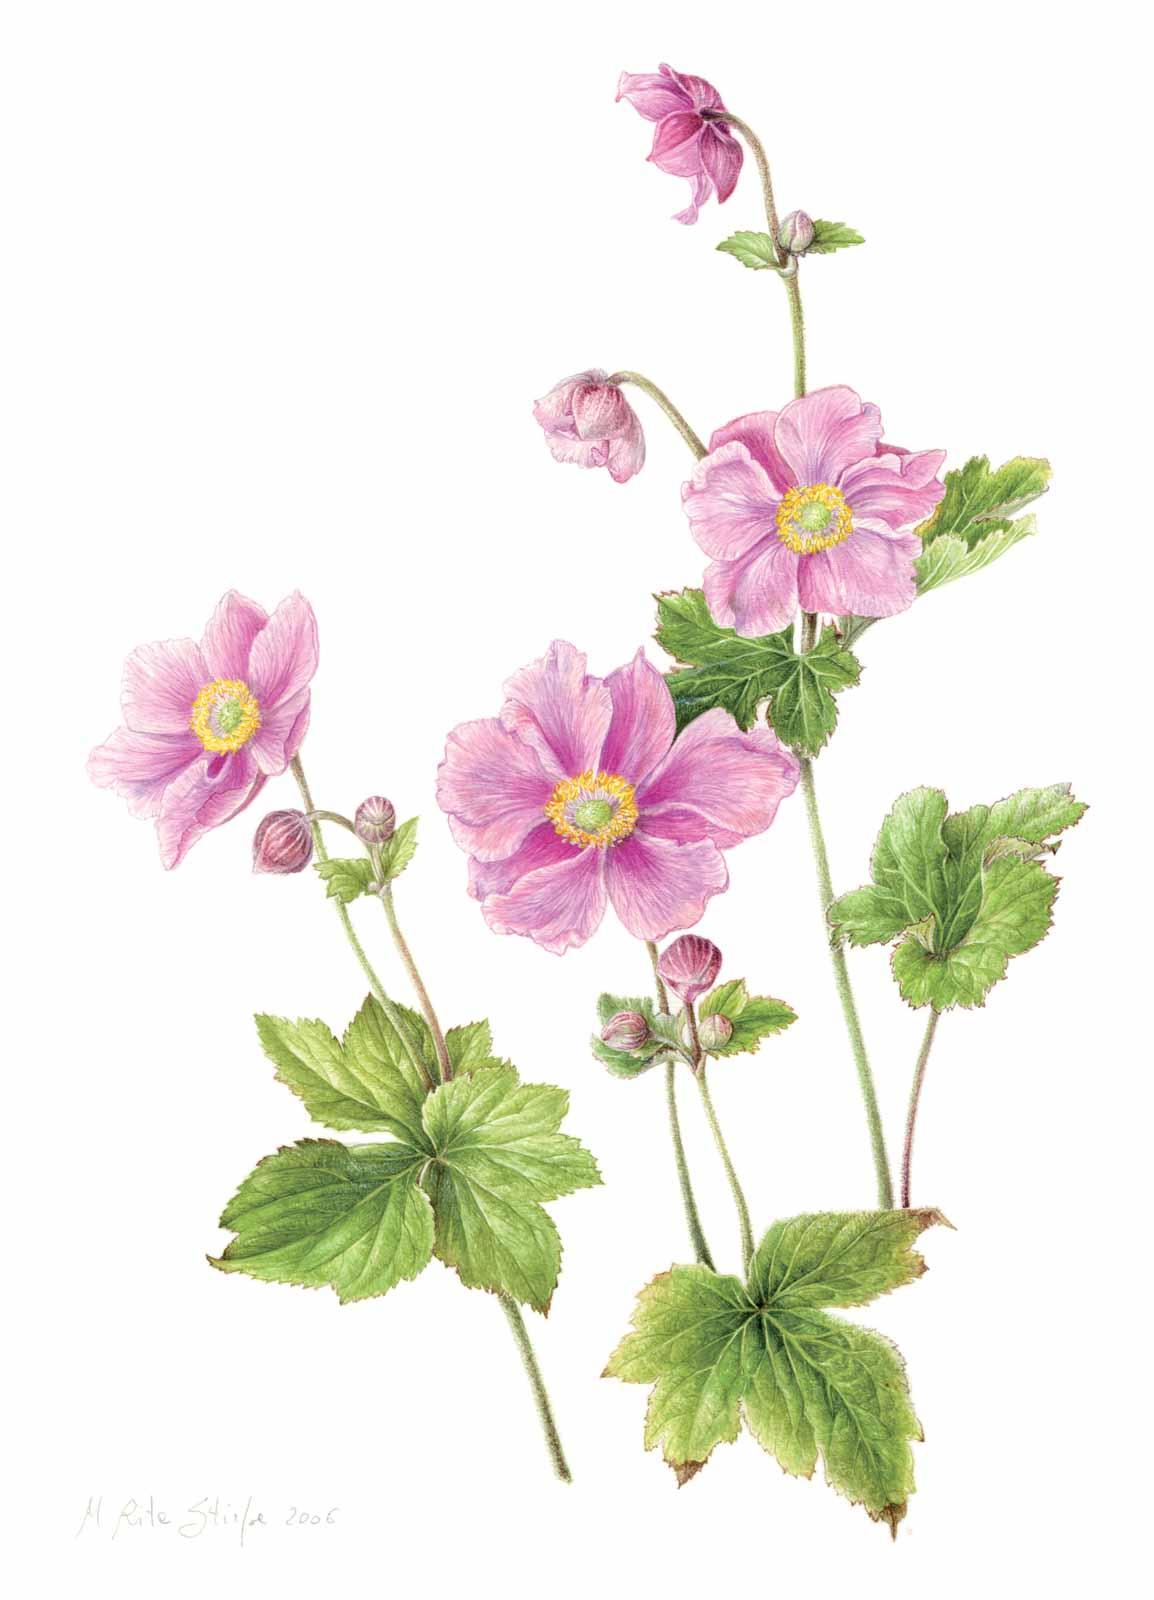 Catalogo - Ars Botanica - Stampa 13